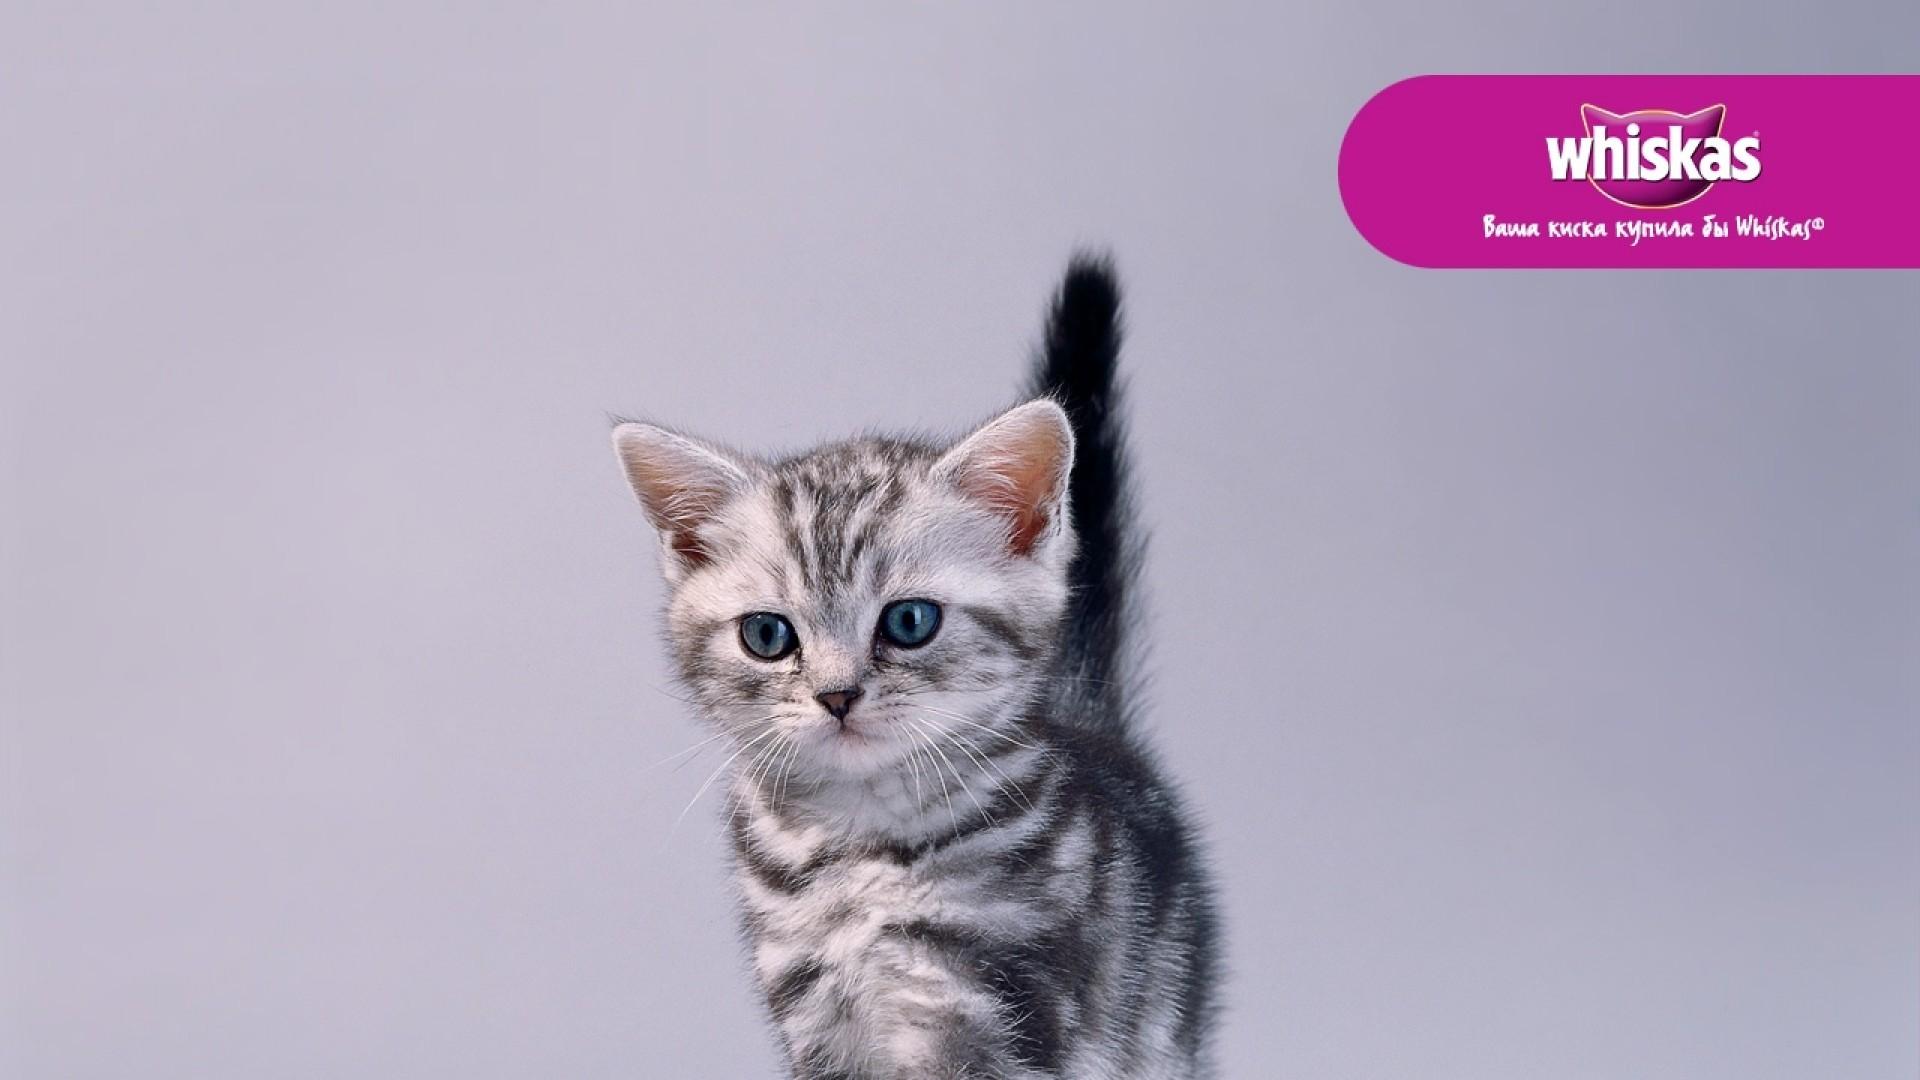 Wallpaper whiskas, cat, cute, food